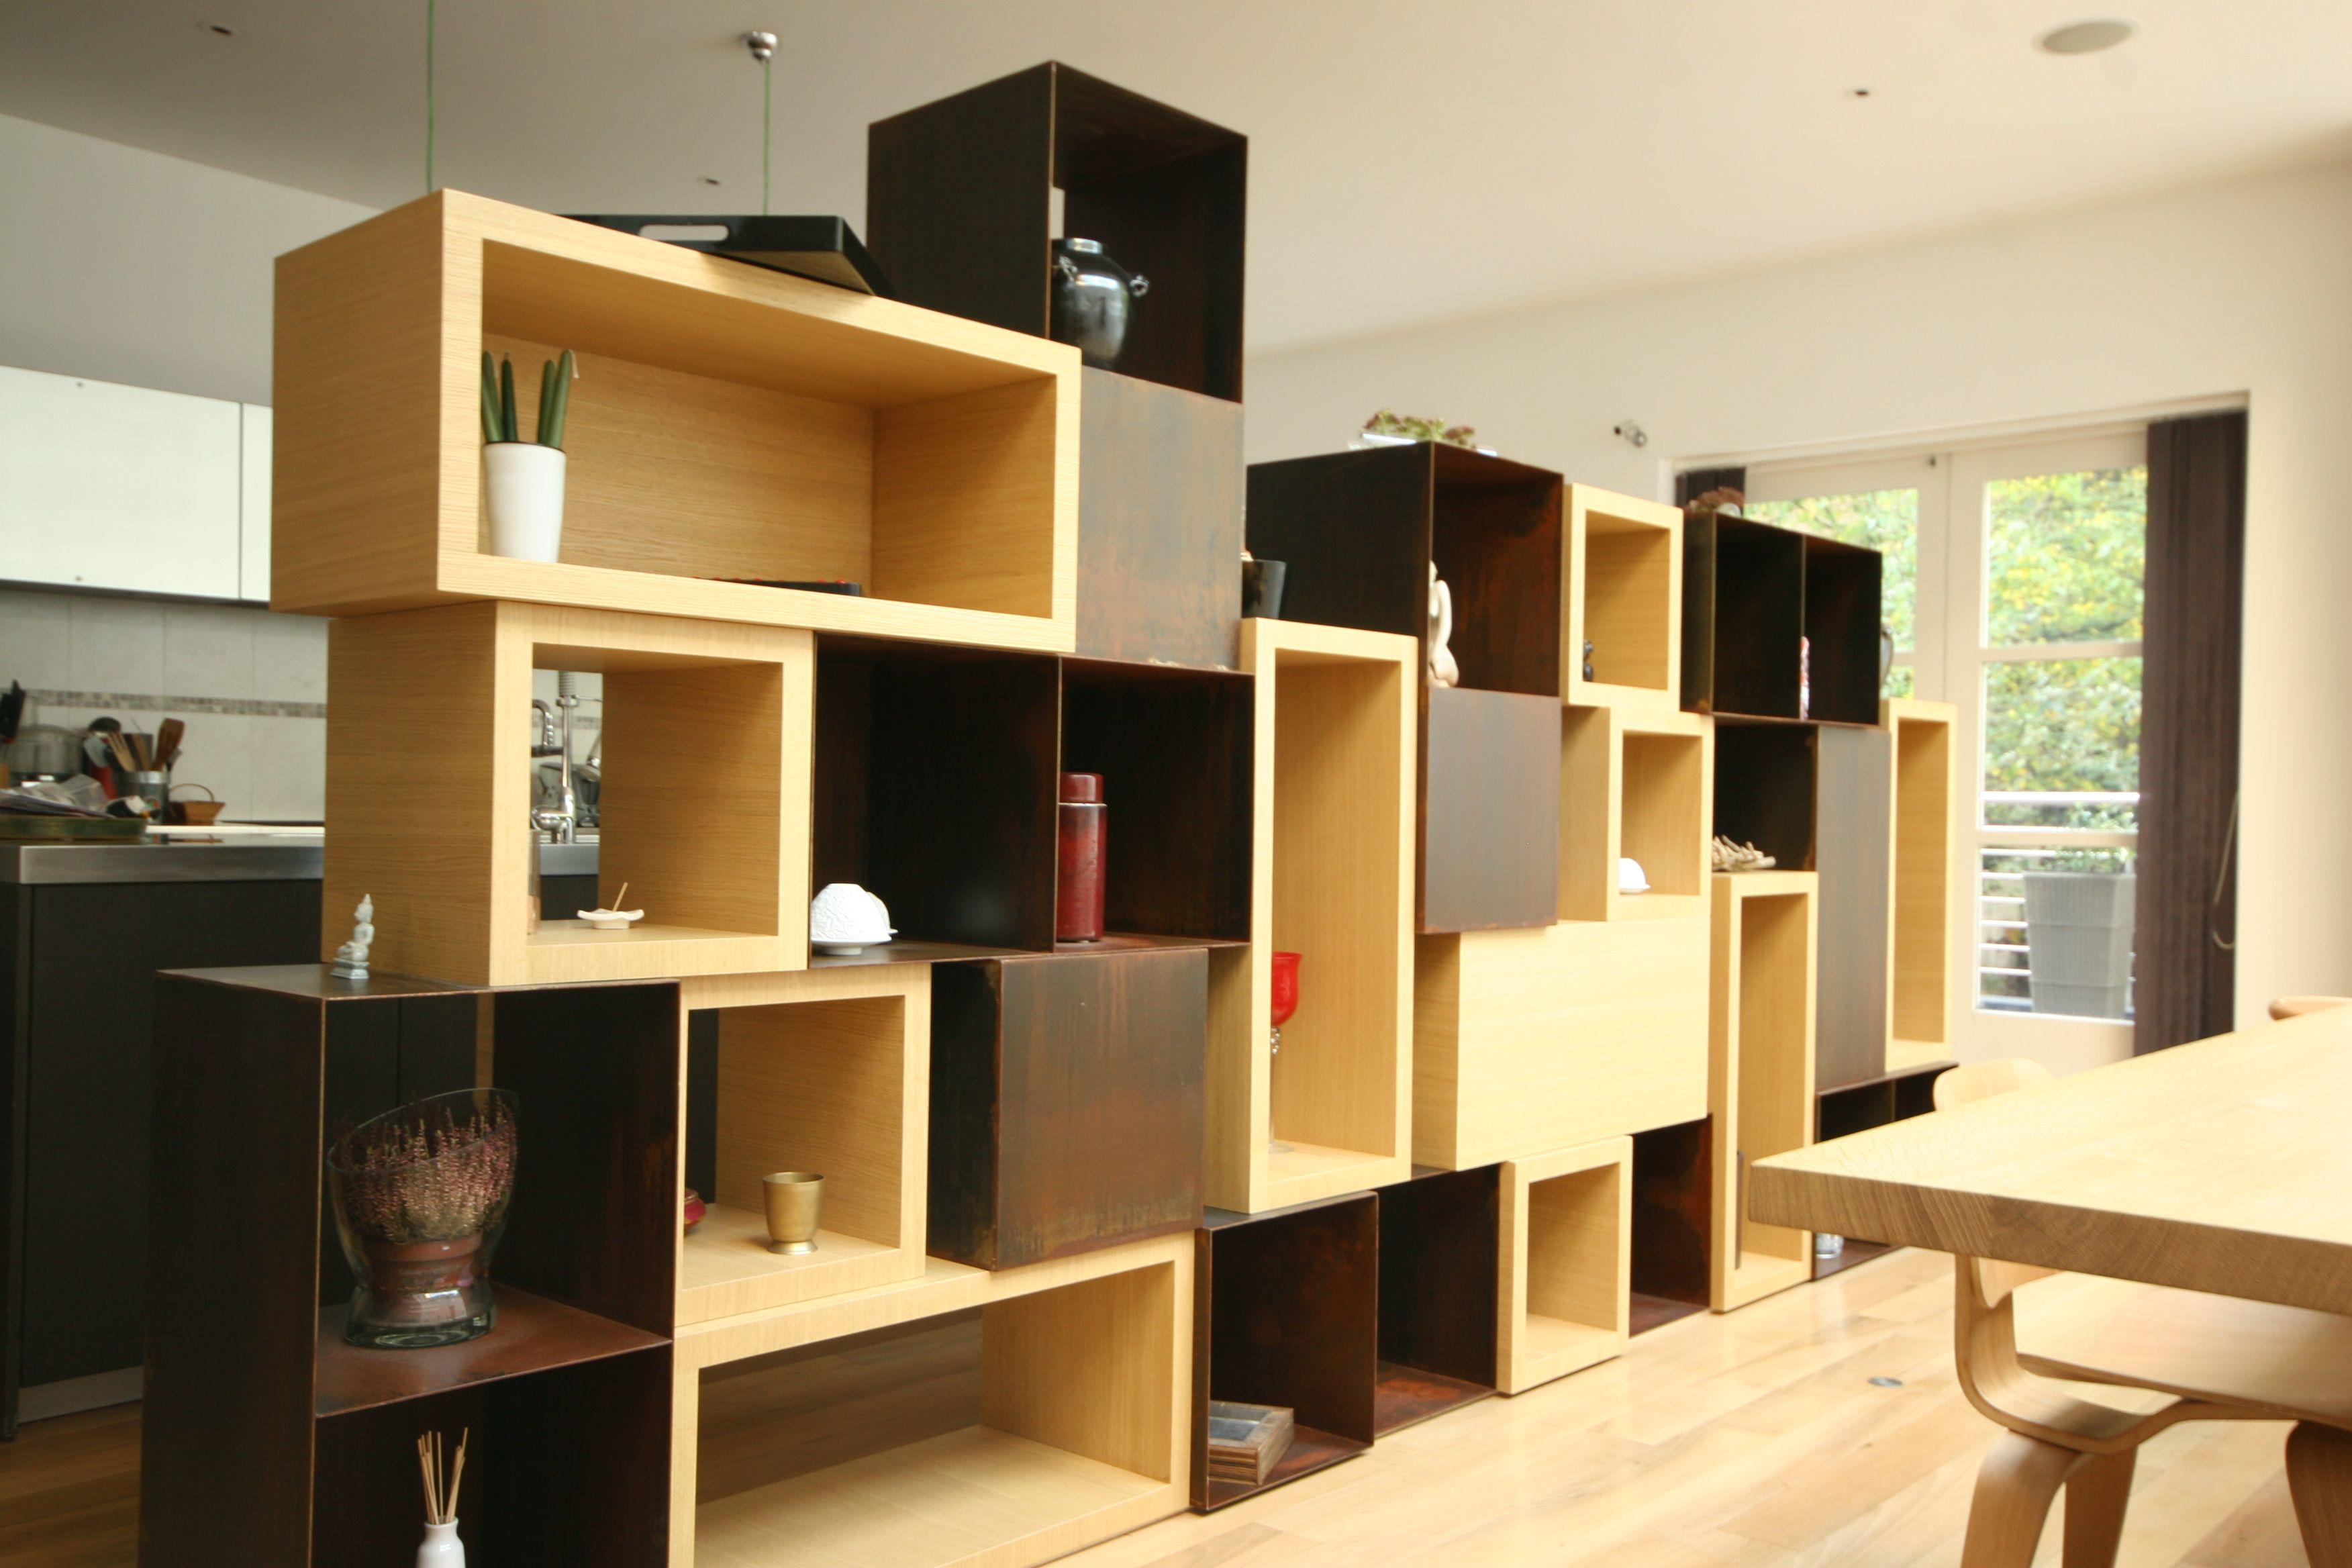 meuble s paration bois m tal id es maison pinterest showroom and atelier. Black Bedroom Furniture Sets. Home Design Ideas